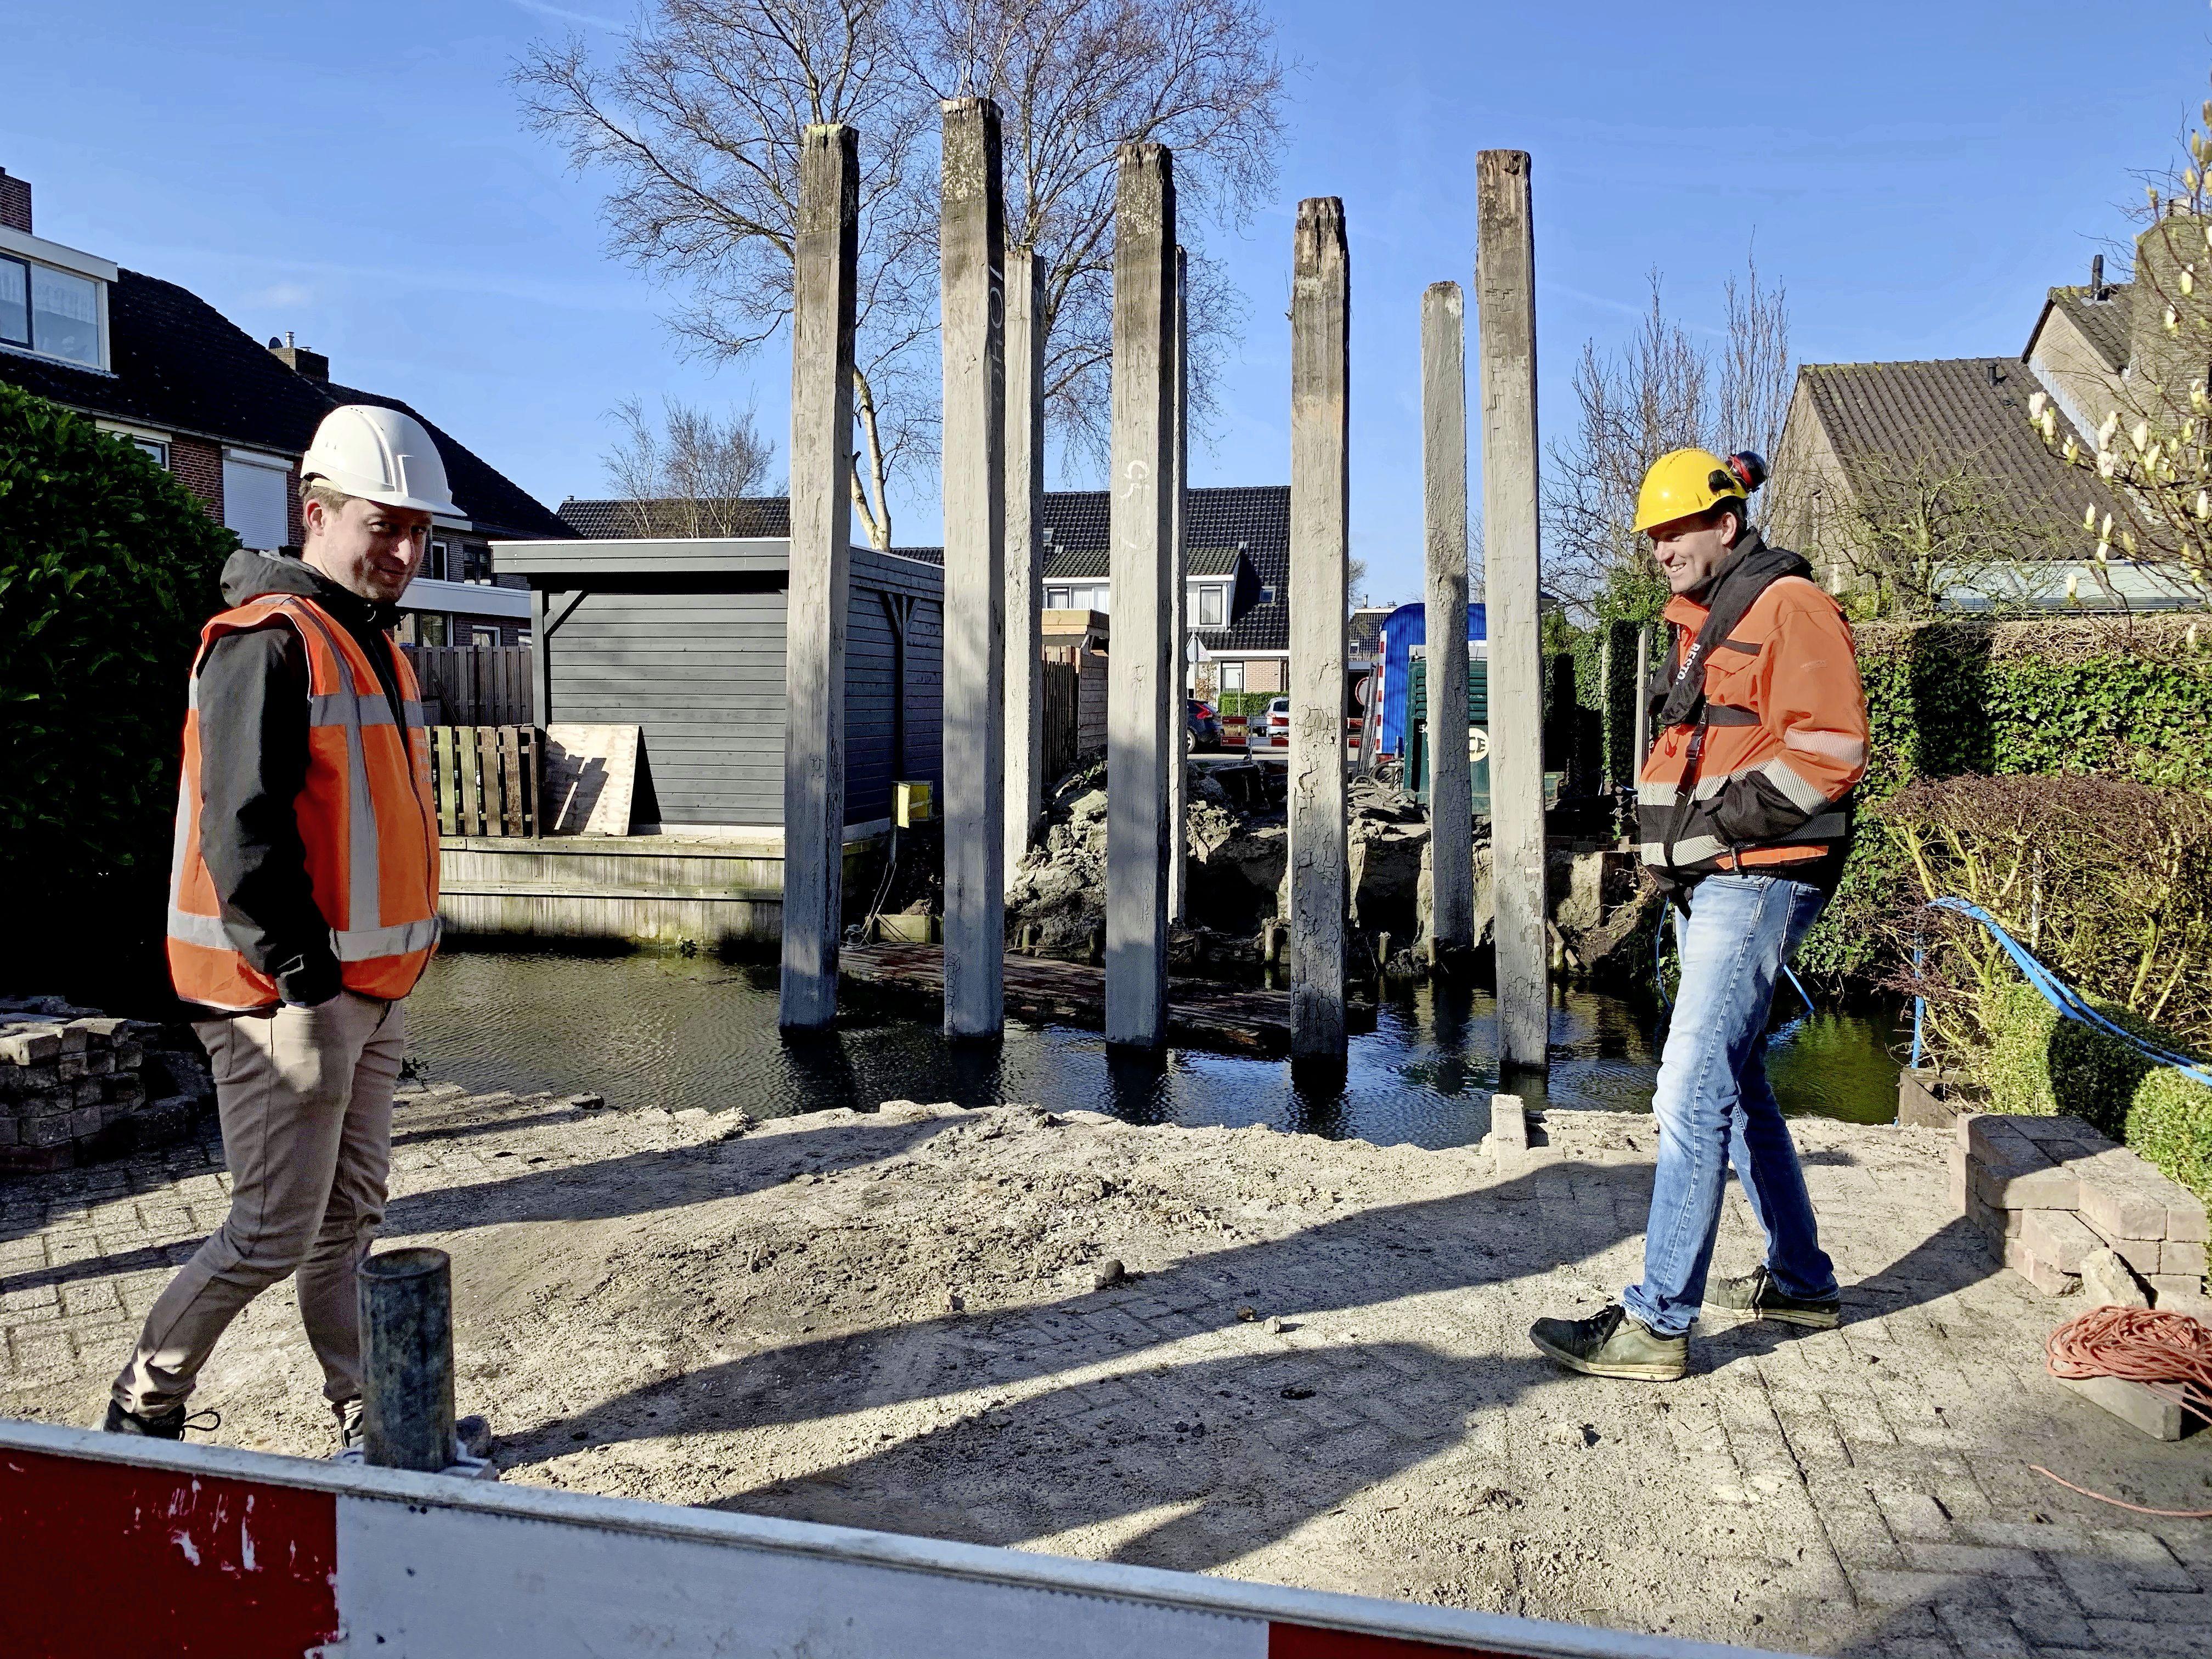 Nieuwe brug in Hoogkarspel: nog vier hardnekkige houten palen te gaan